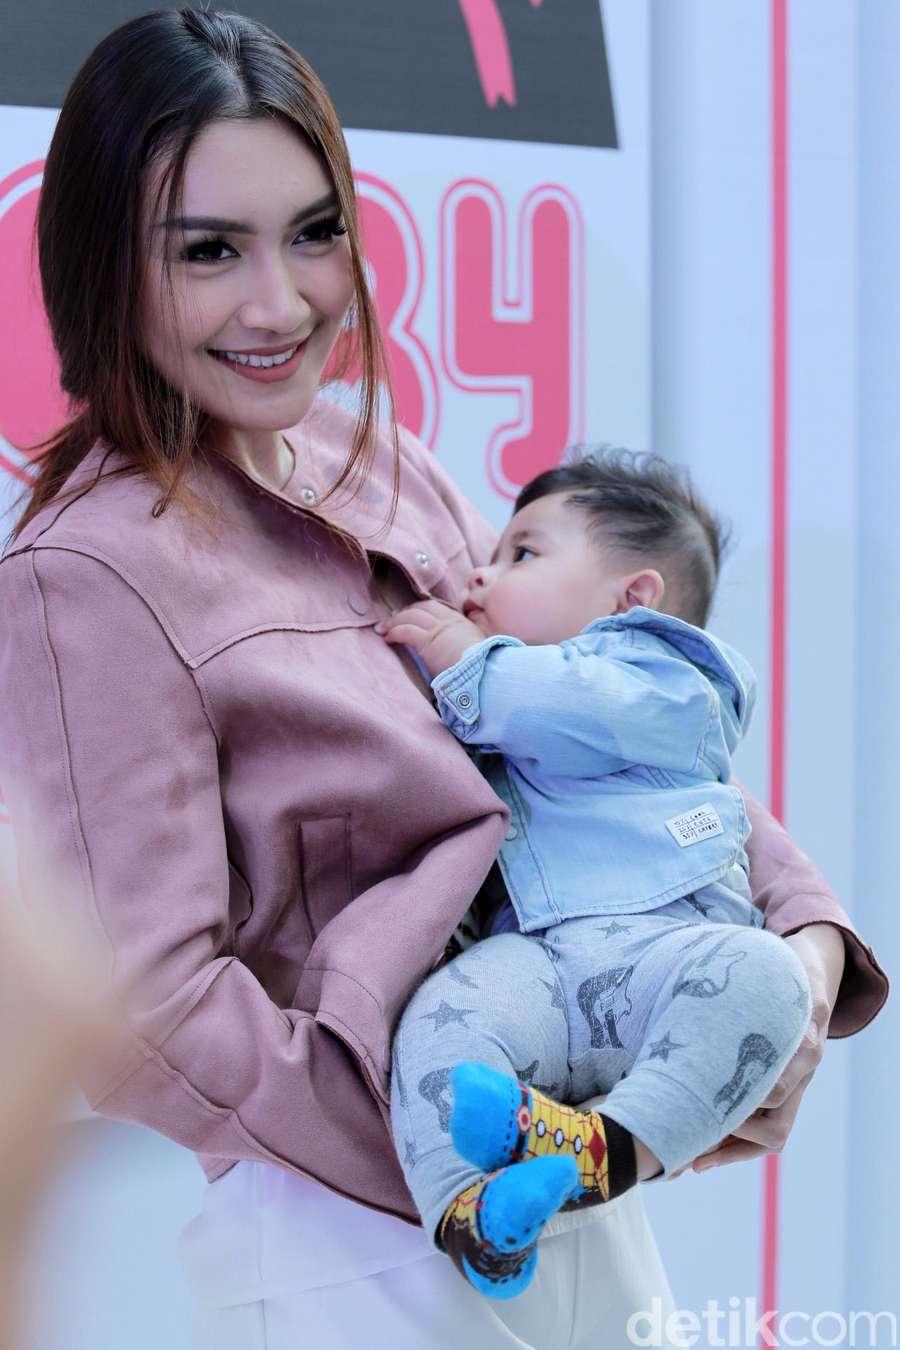 Laudya Cynthia Bella Resmi Menikah, Stella Maxwell Kekasih Kristen Stewart